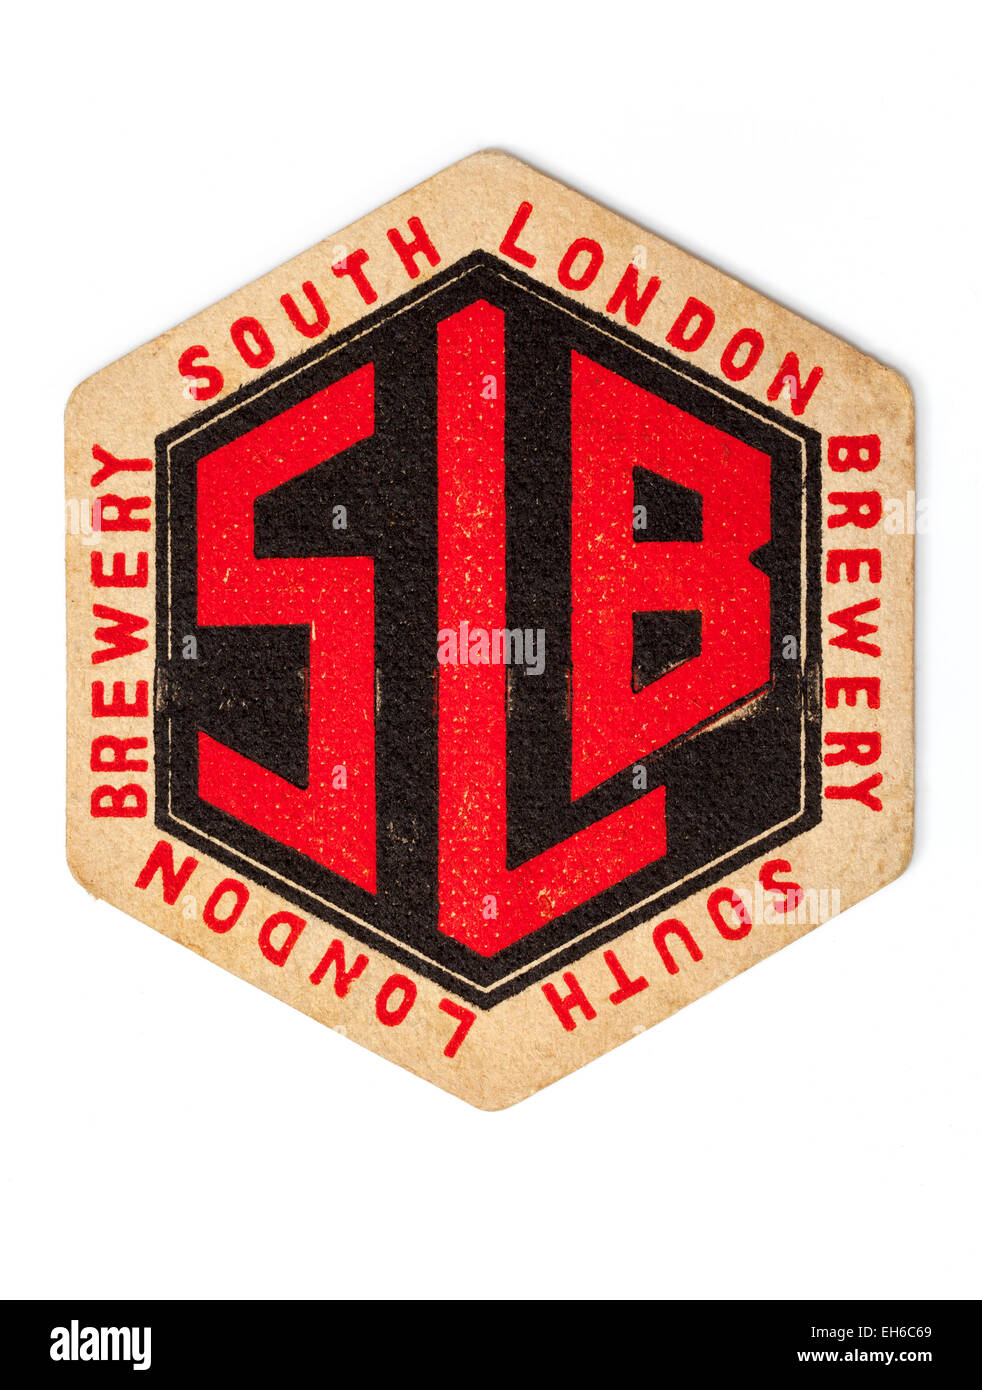 Vintage British Beermat Advertising South London Brewery - Stock Image